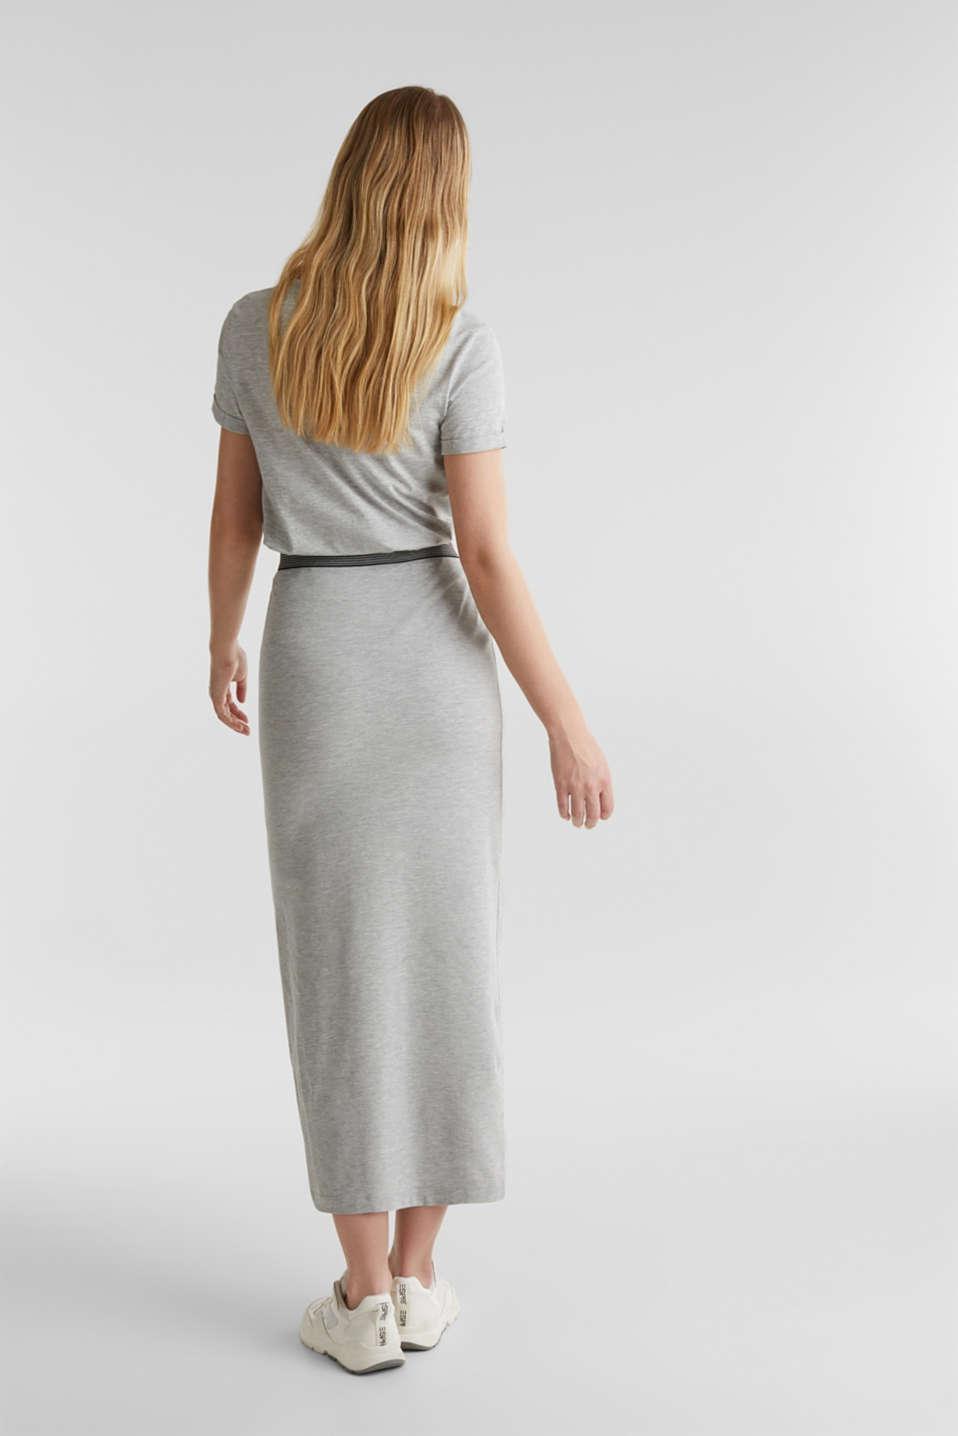 Stretch jersey skirt, LIGHT GREY 5, detail image number 3